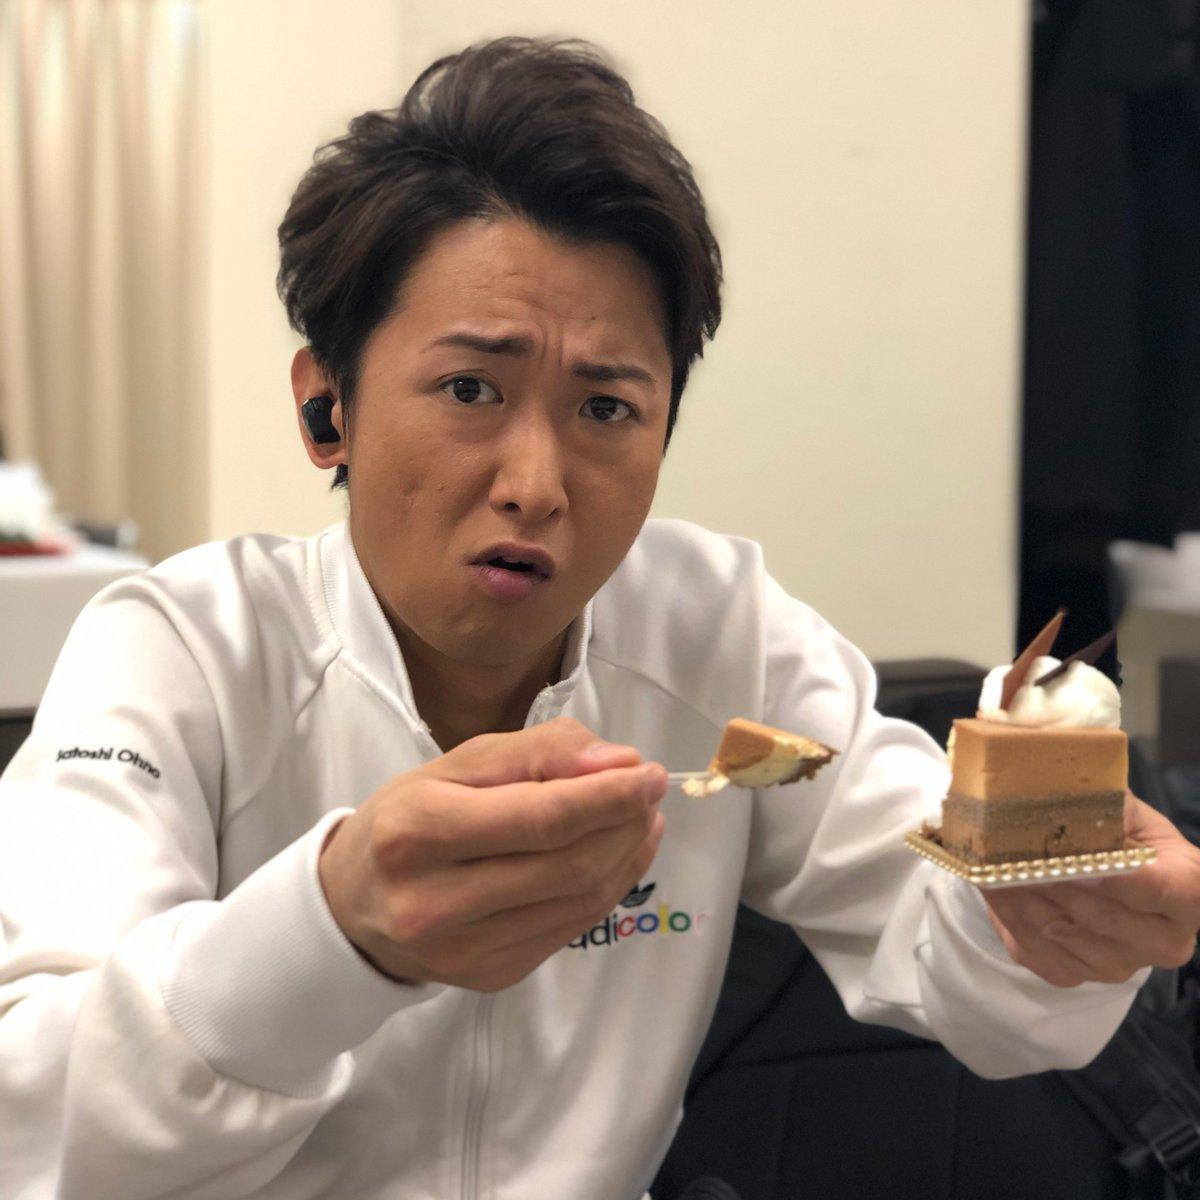 ARASHIさんの投稿画像